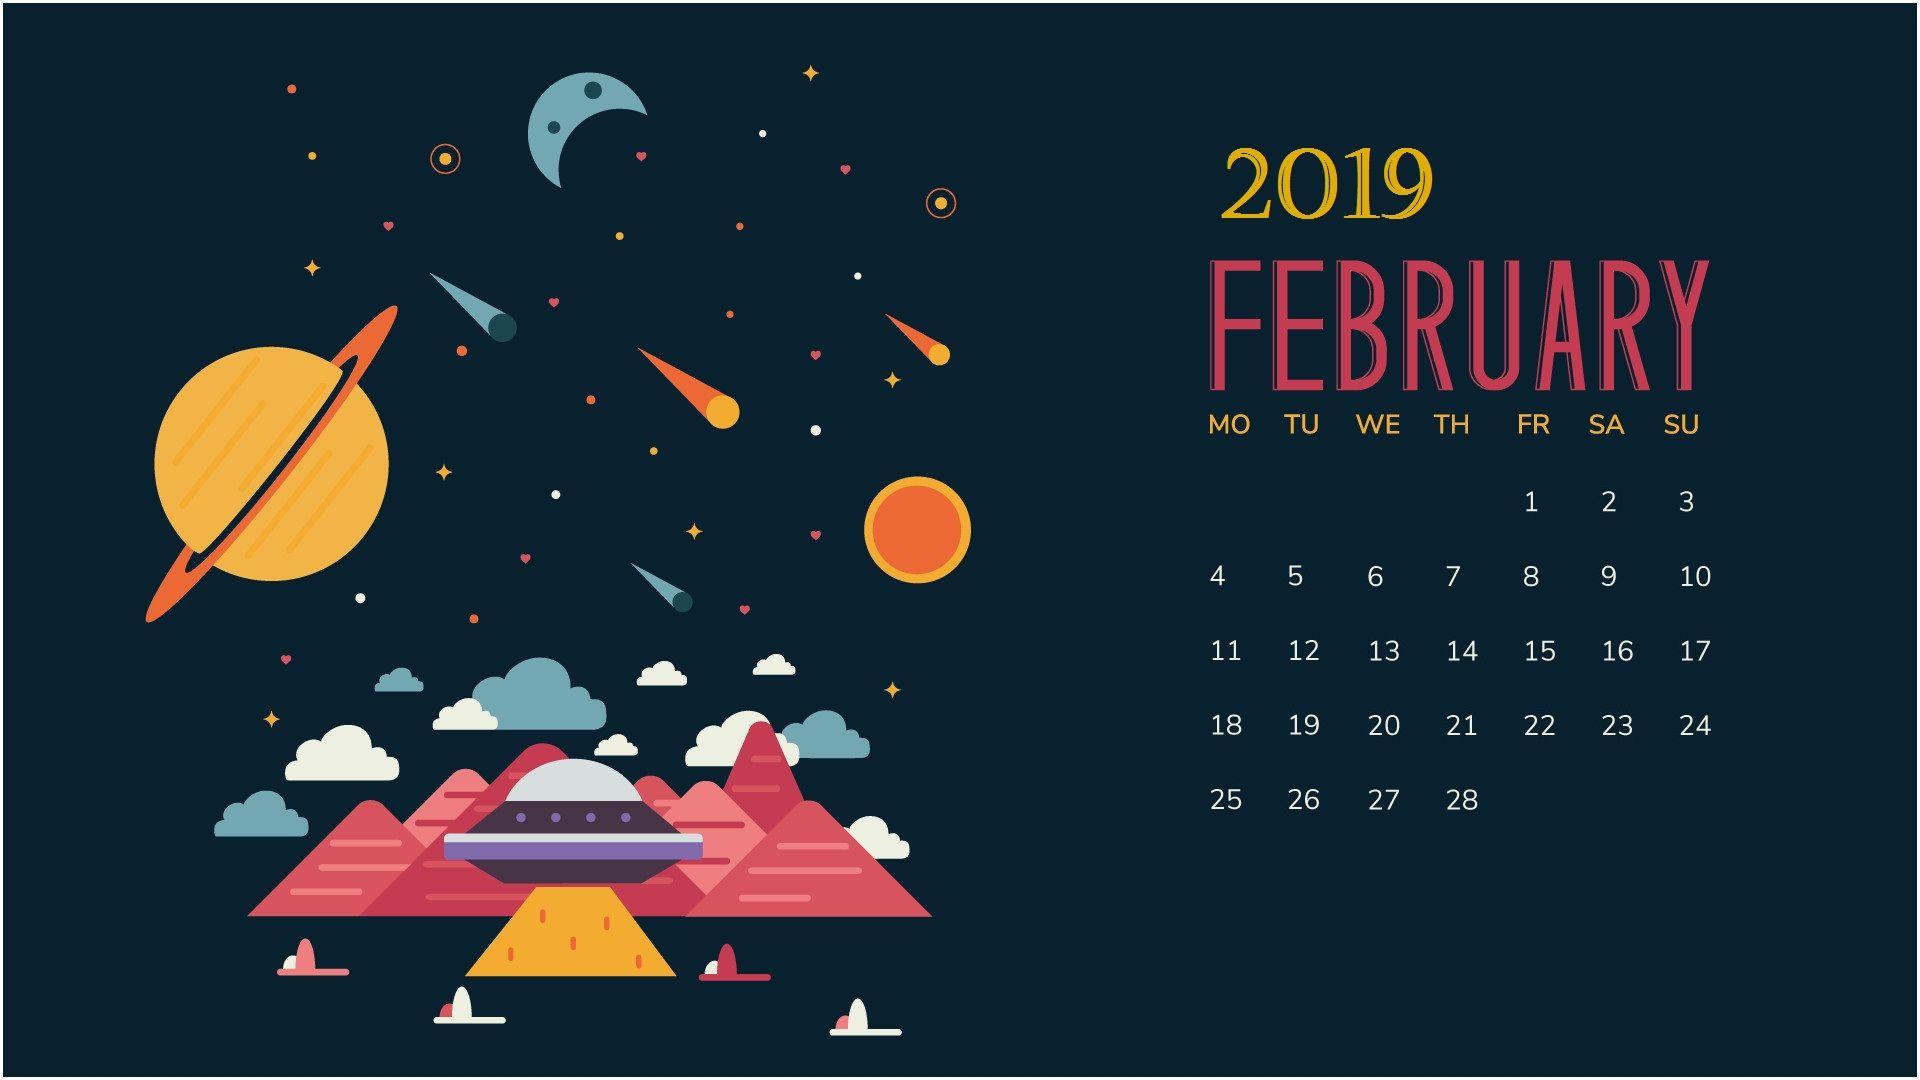 La Calendar February 2019 February 2019 Desktop Calendar | Calendar Designs in 2019